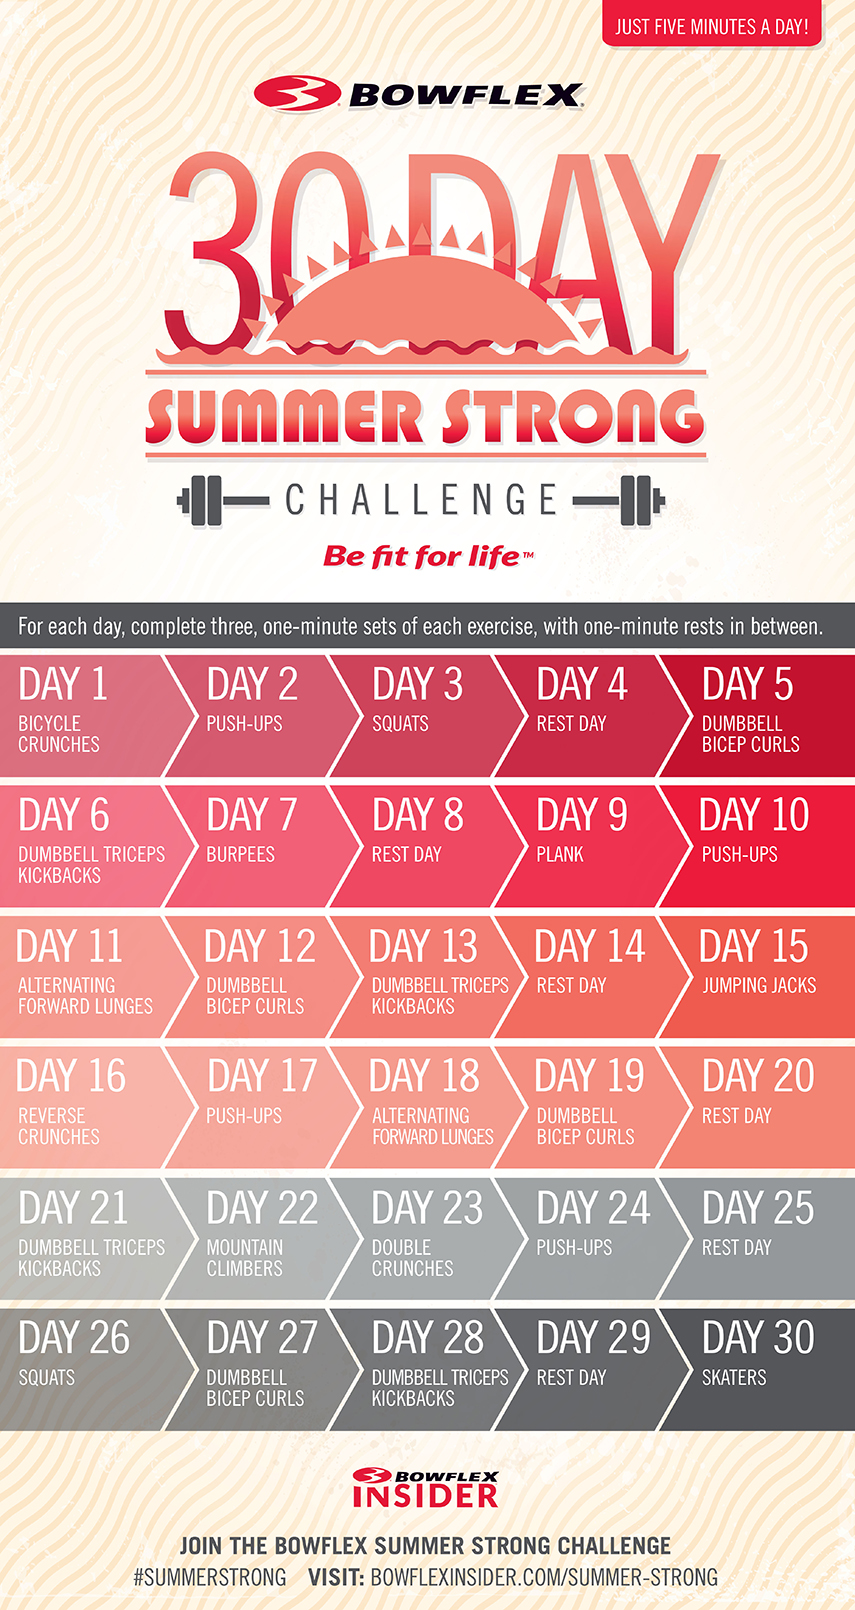 Bowflex 30-Day Summer Strong Challenge